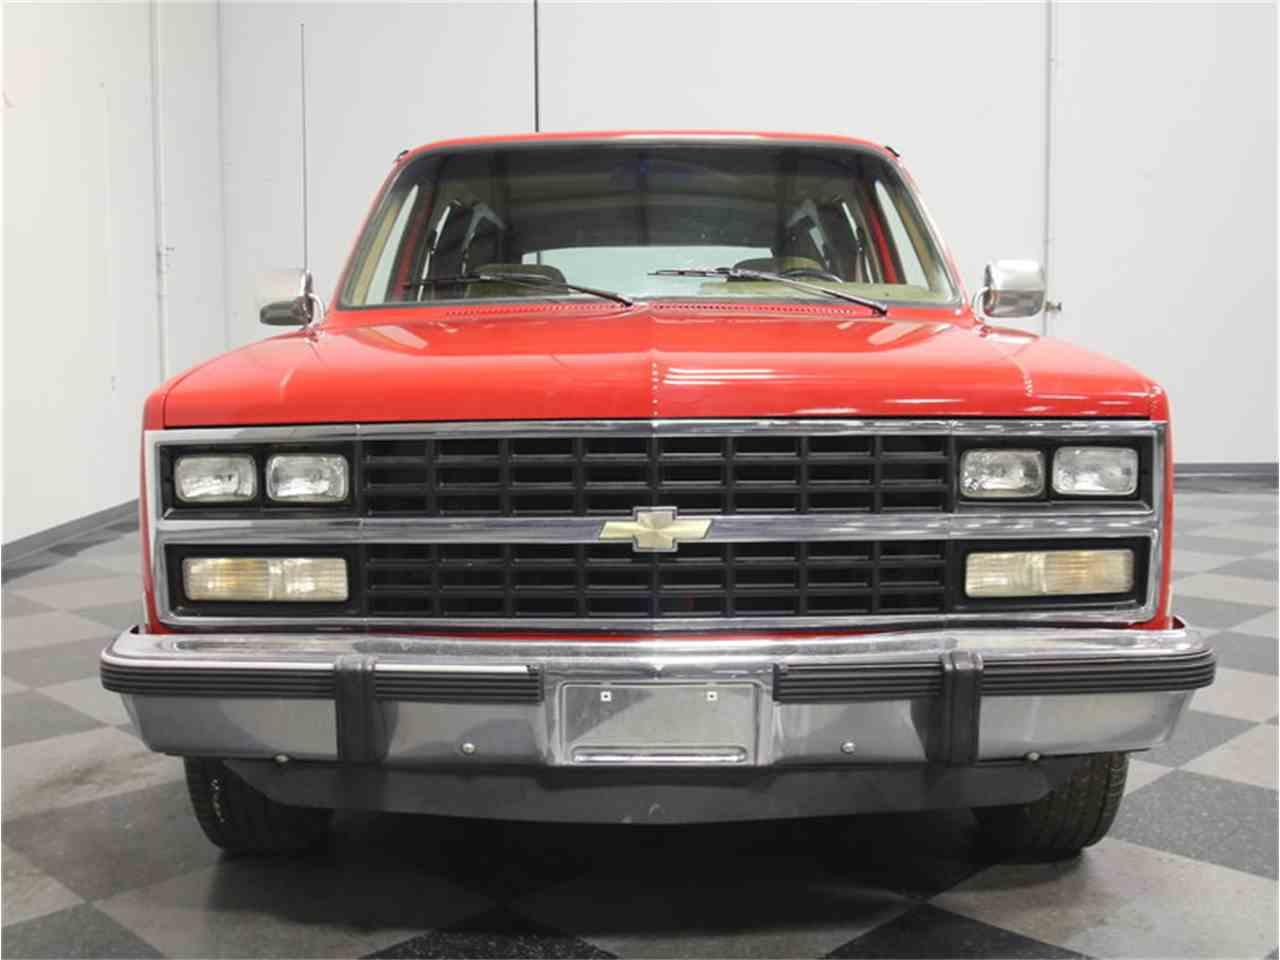 Large Picture of '85 Chevrolet Suburban located in Lithia Springs Georgia - $11,995.00 - KIU1